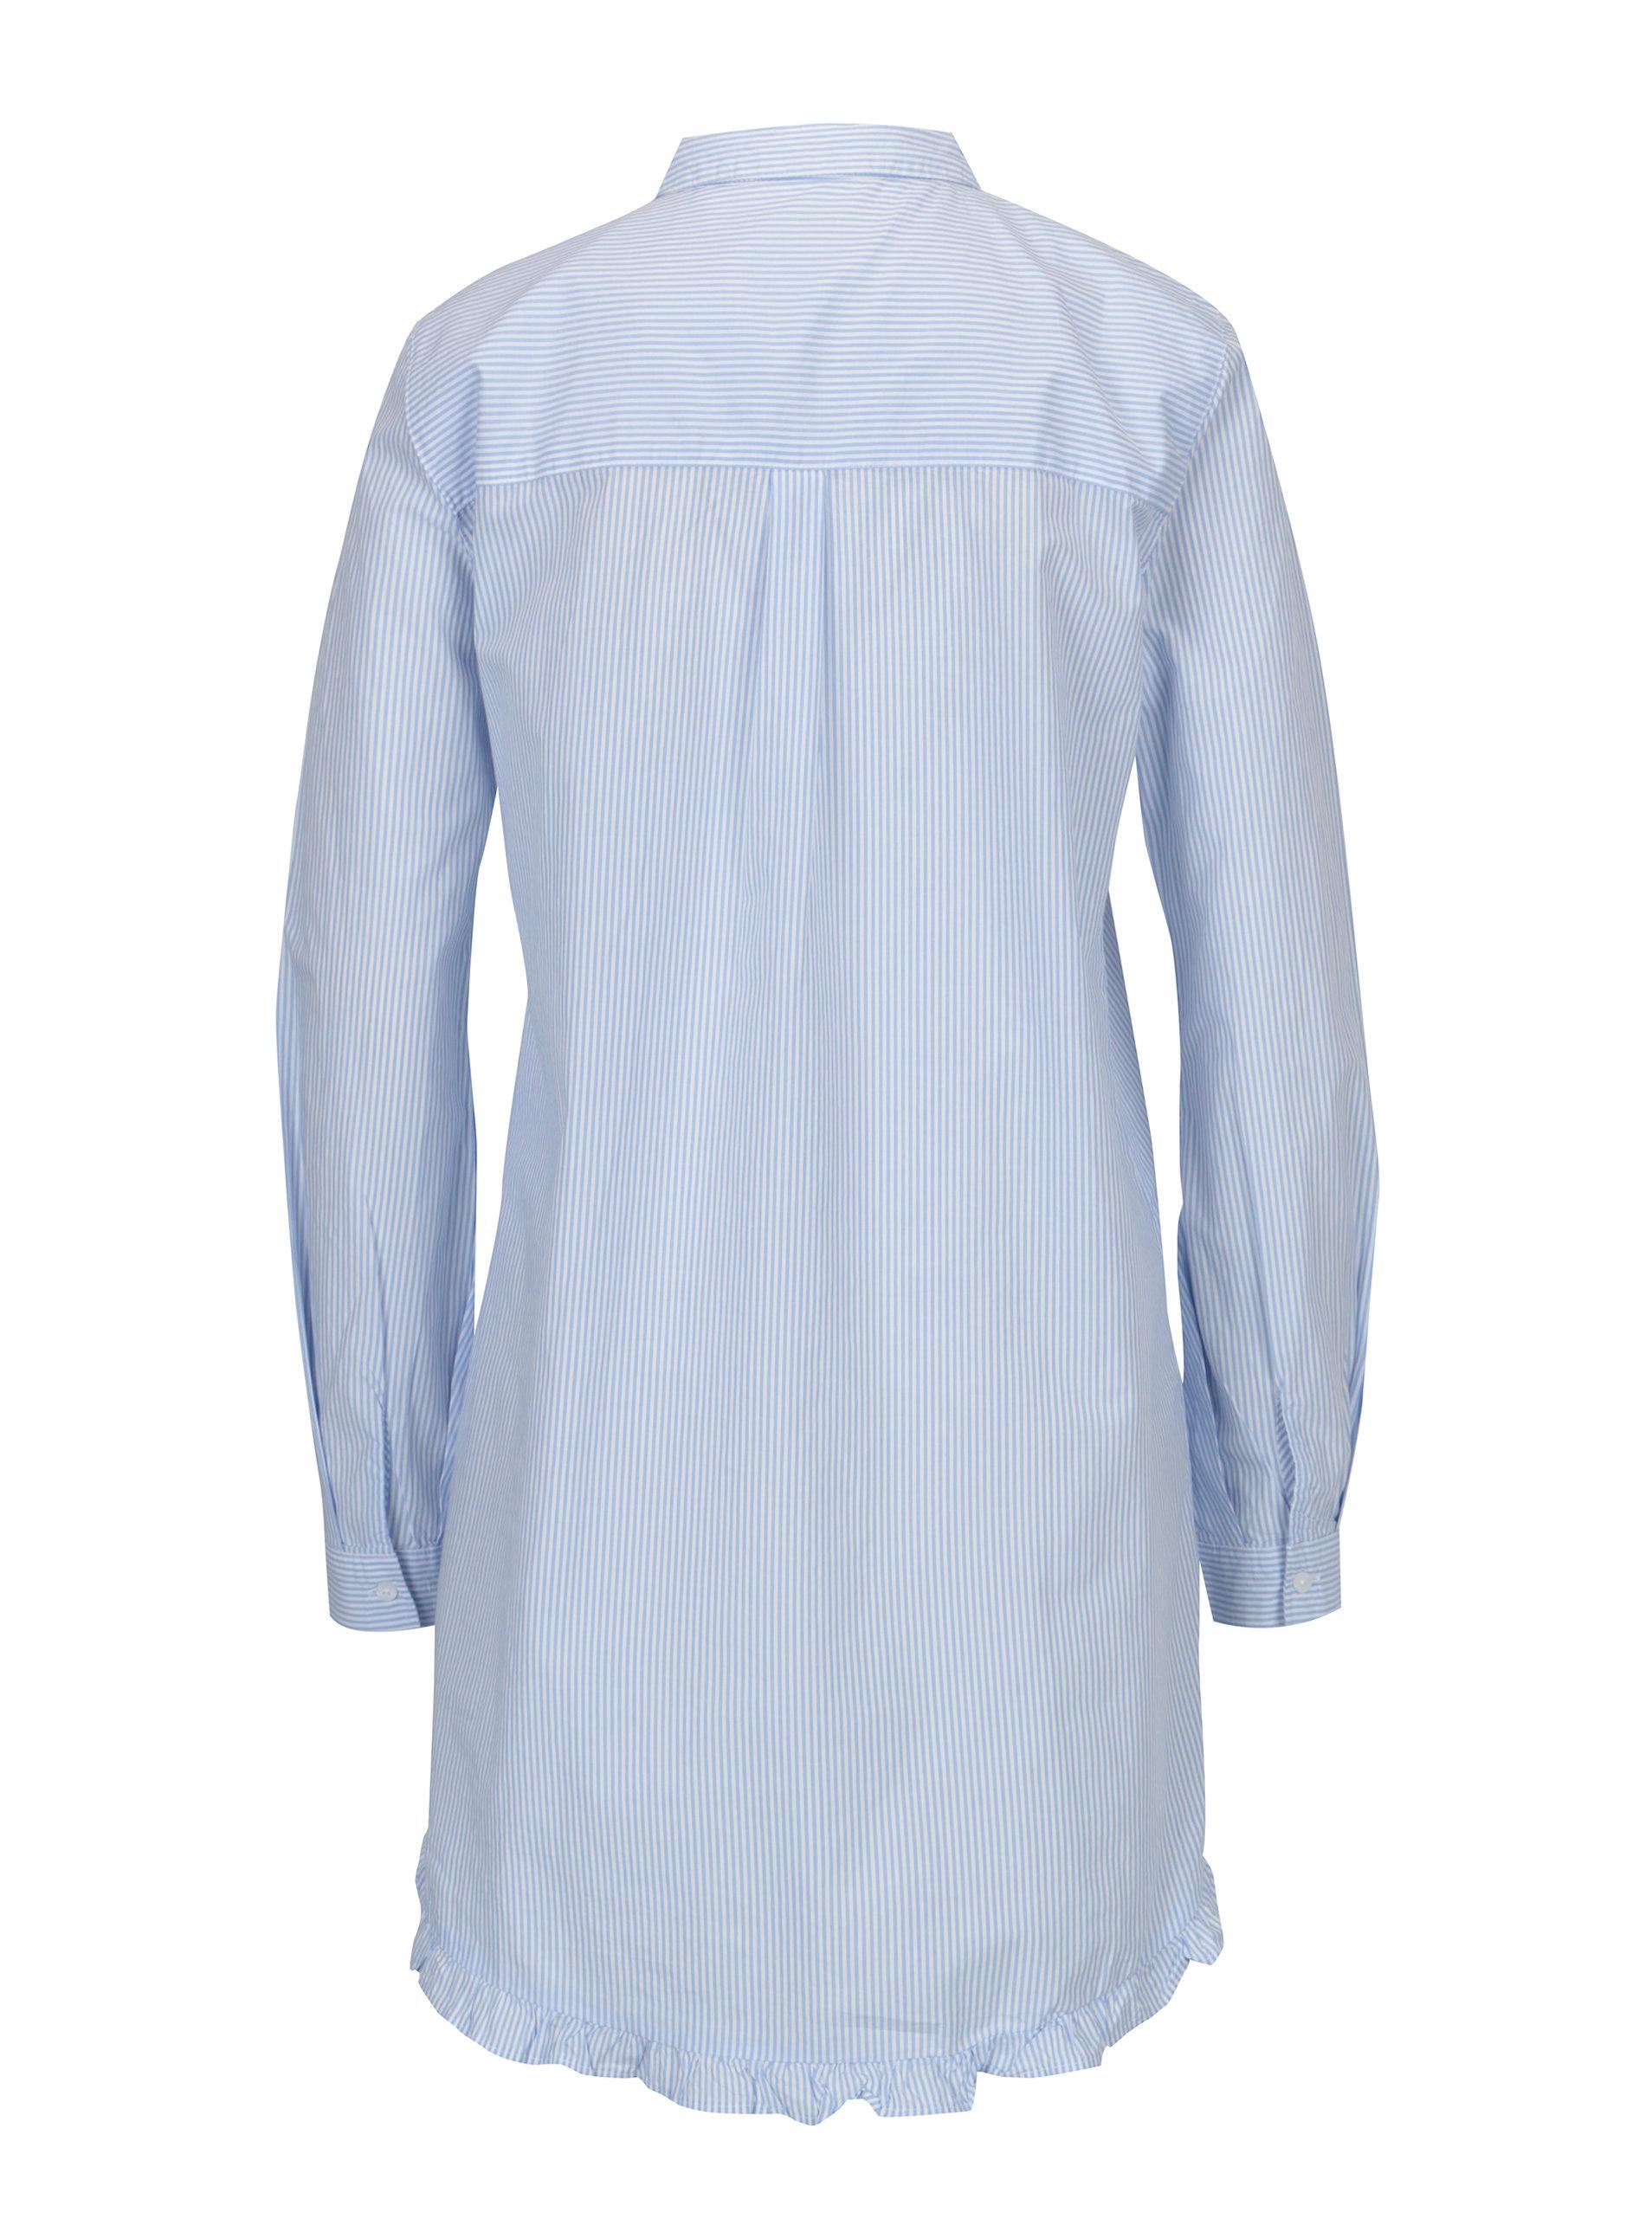 5f261923af1d Bielo-modrá dlhá pruhovaná áčková košeľa ONLY Monique ...